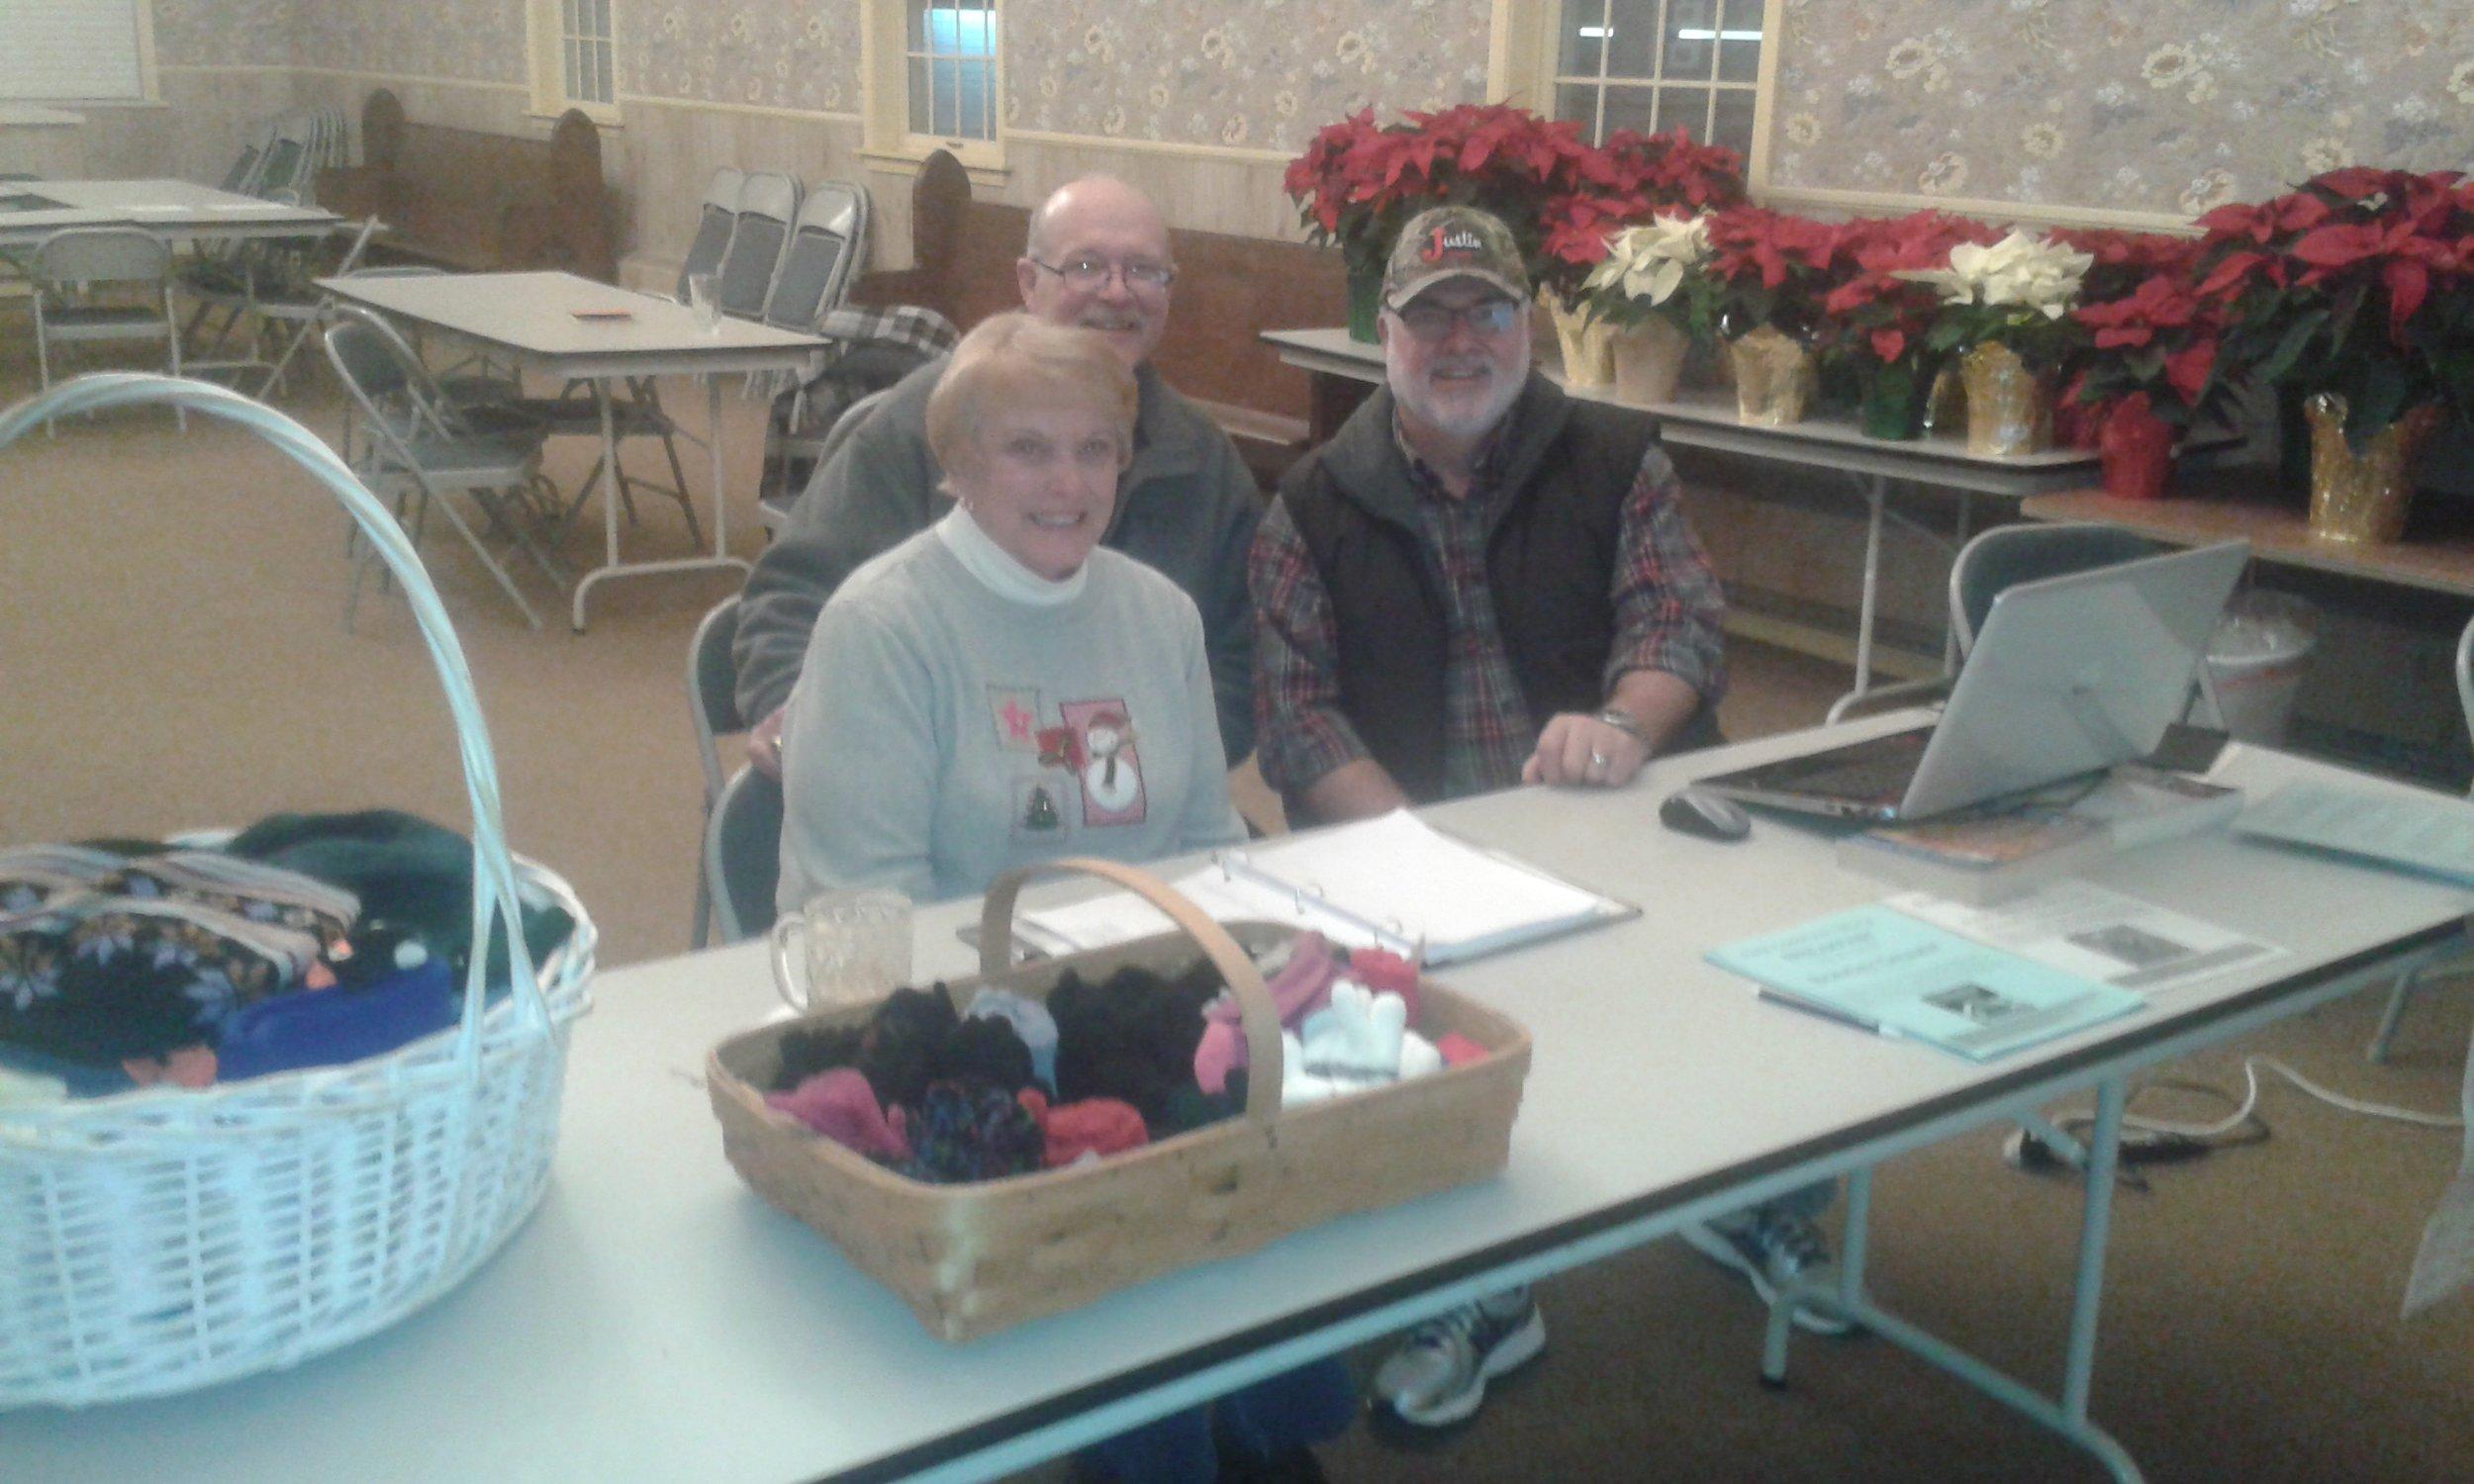 Karen Metsker, Rob Holl, and Fr. Thomas Haynes: NFP distribution day at St Thomas' Plymouth